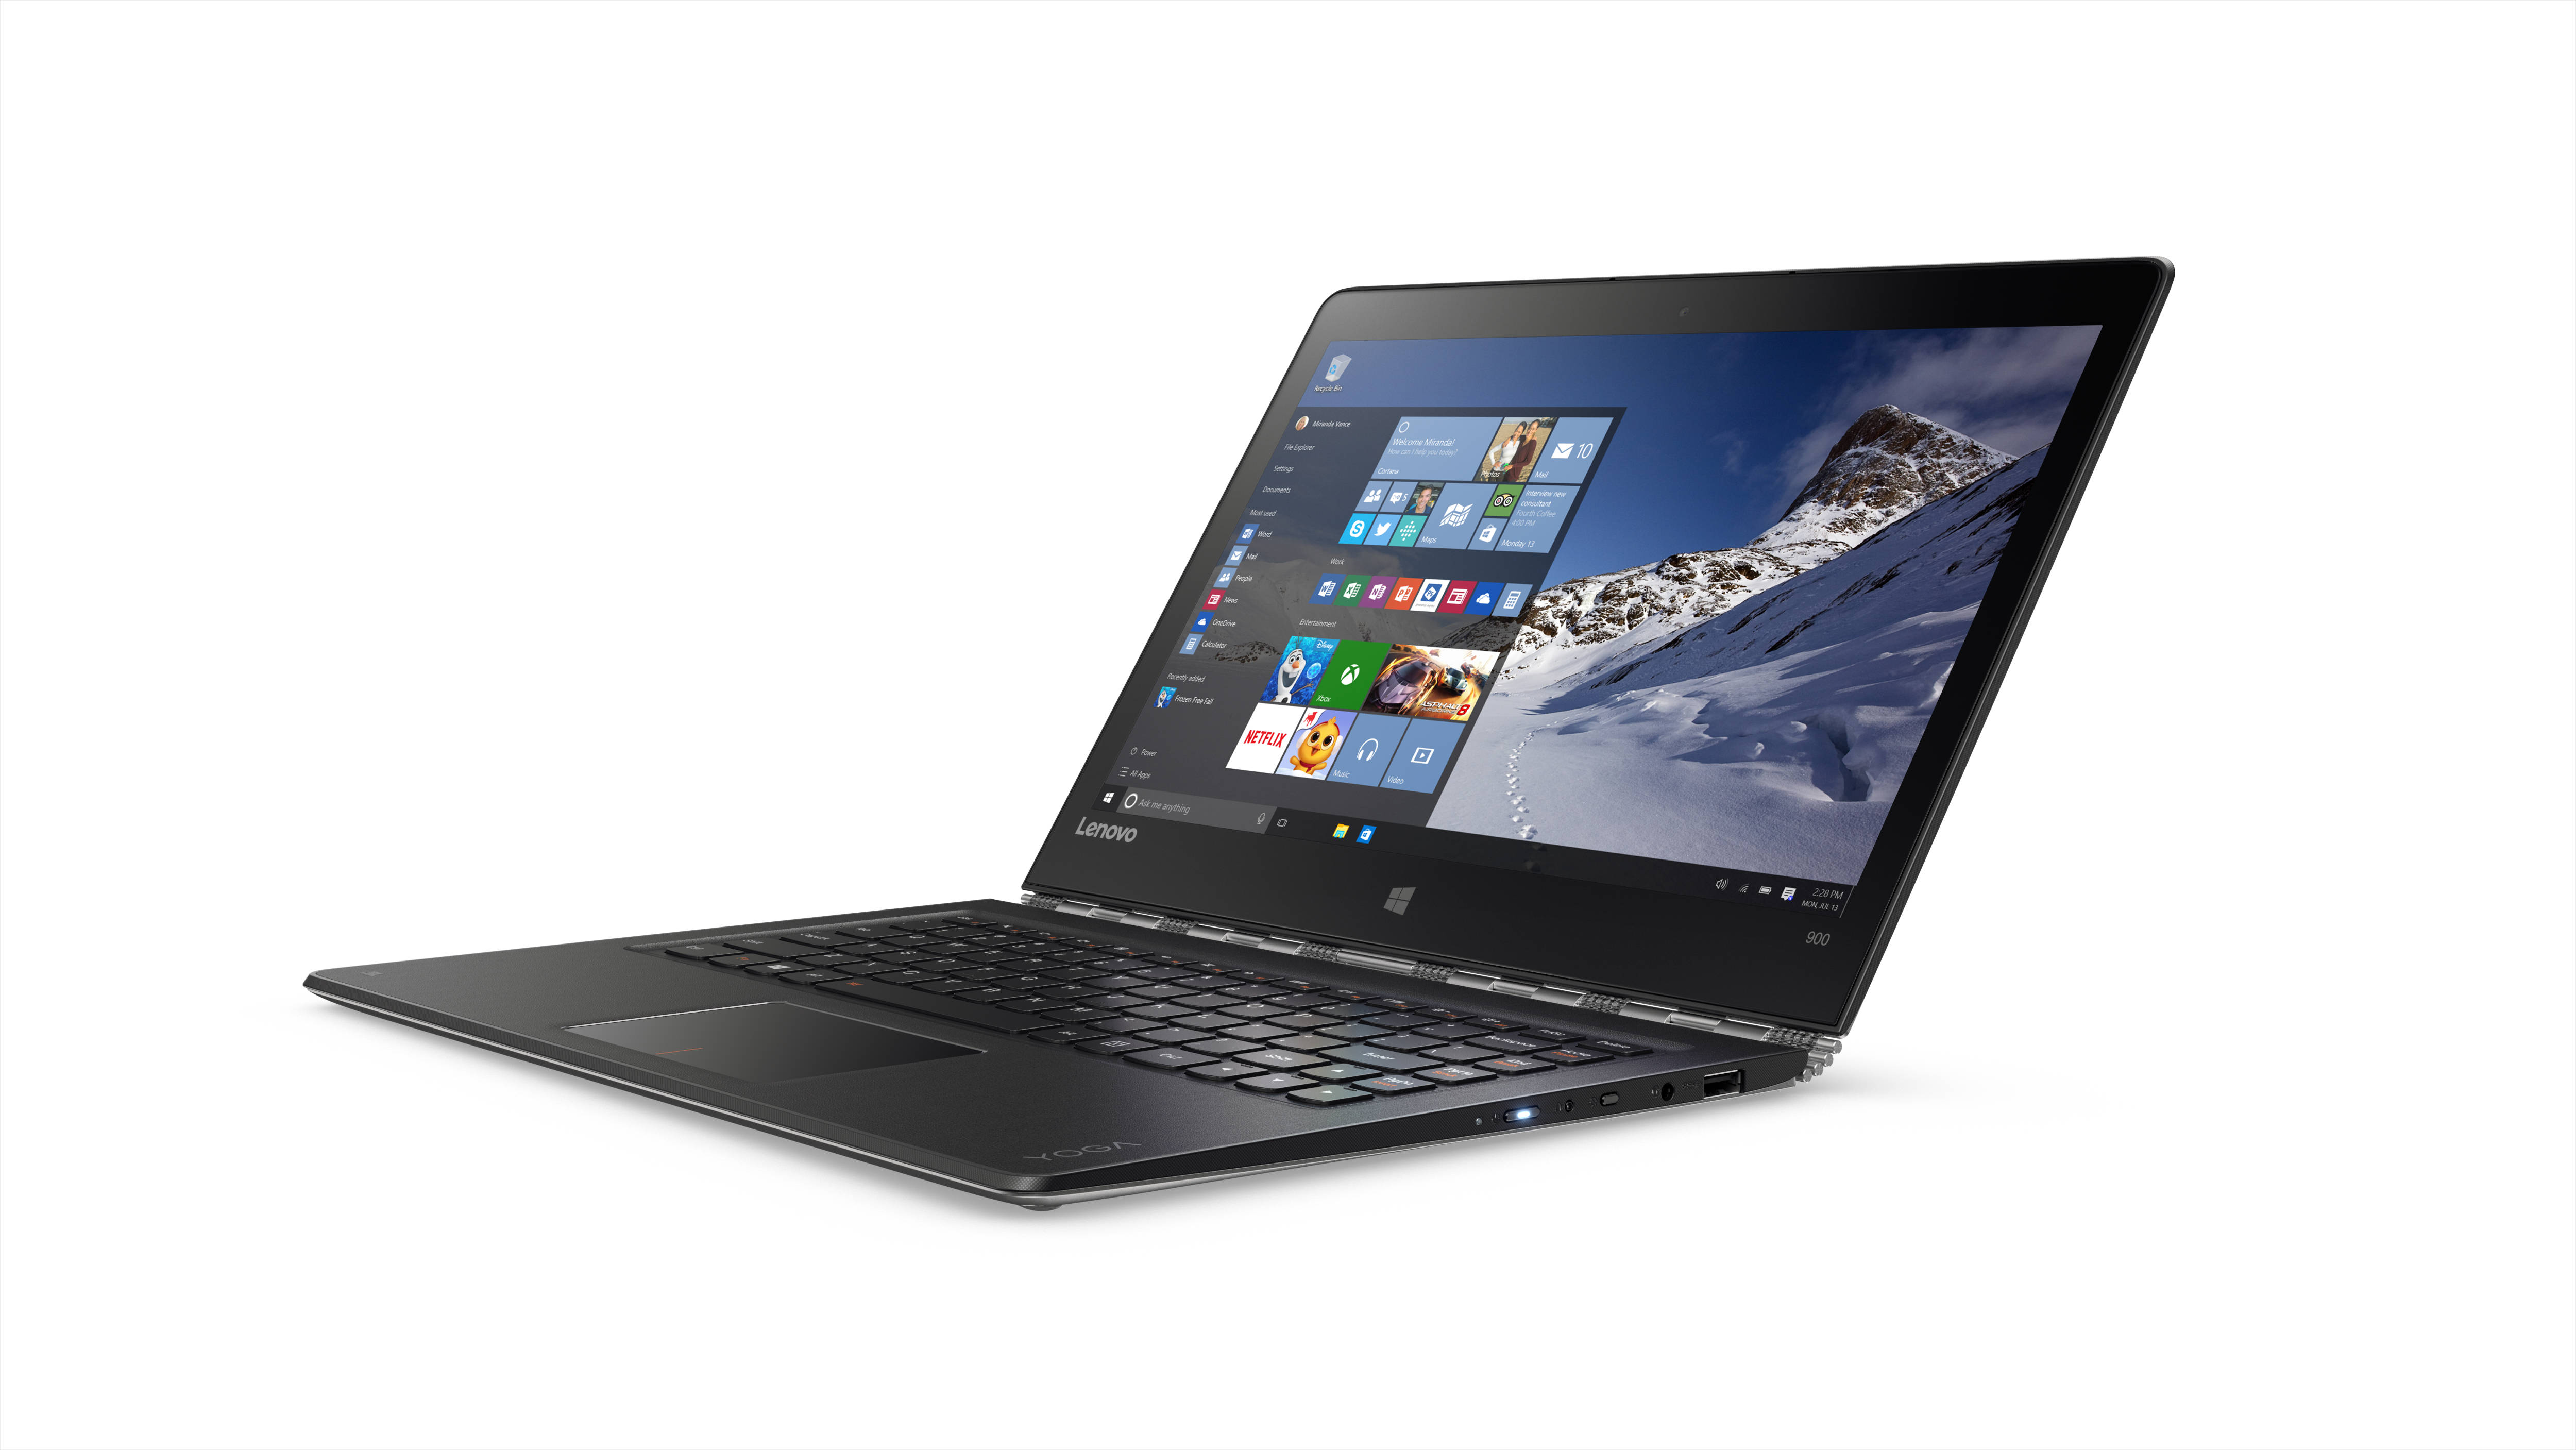 "Lenovo YOGA 900-13ISK2 i5-6260U 2,90GHz/8GB/SSD 256GB/13,3"" QHD+/IPS/multitouch/WIN10 stříbrná 80UE0082CK"